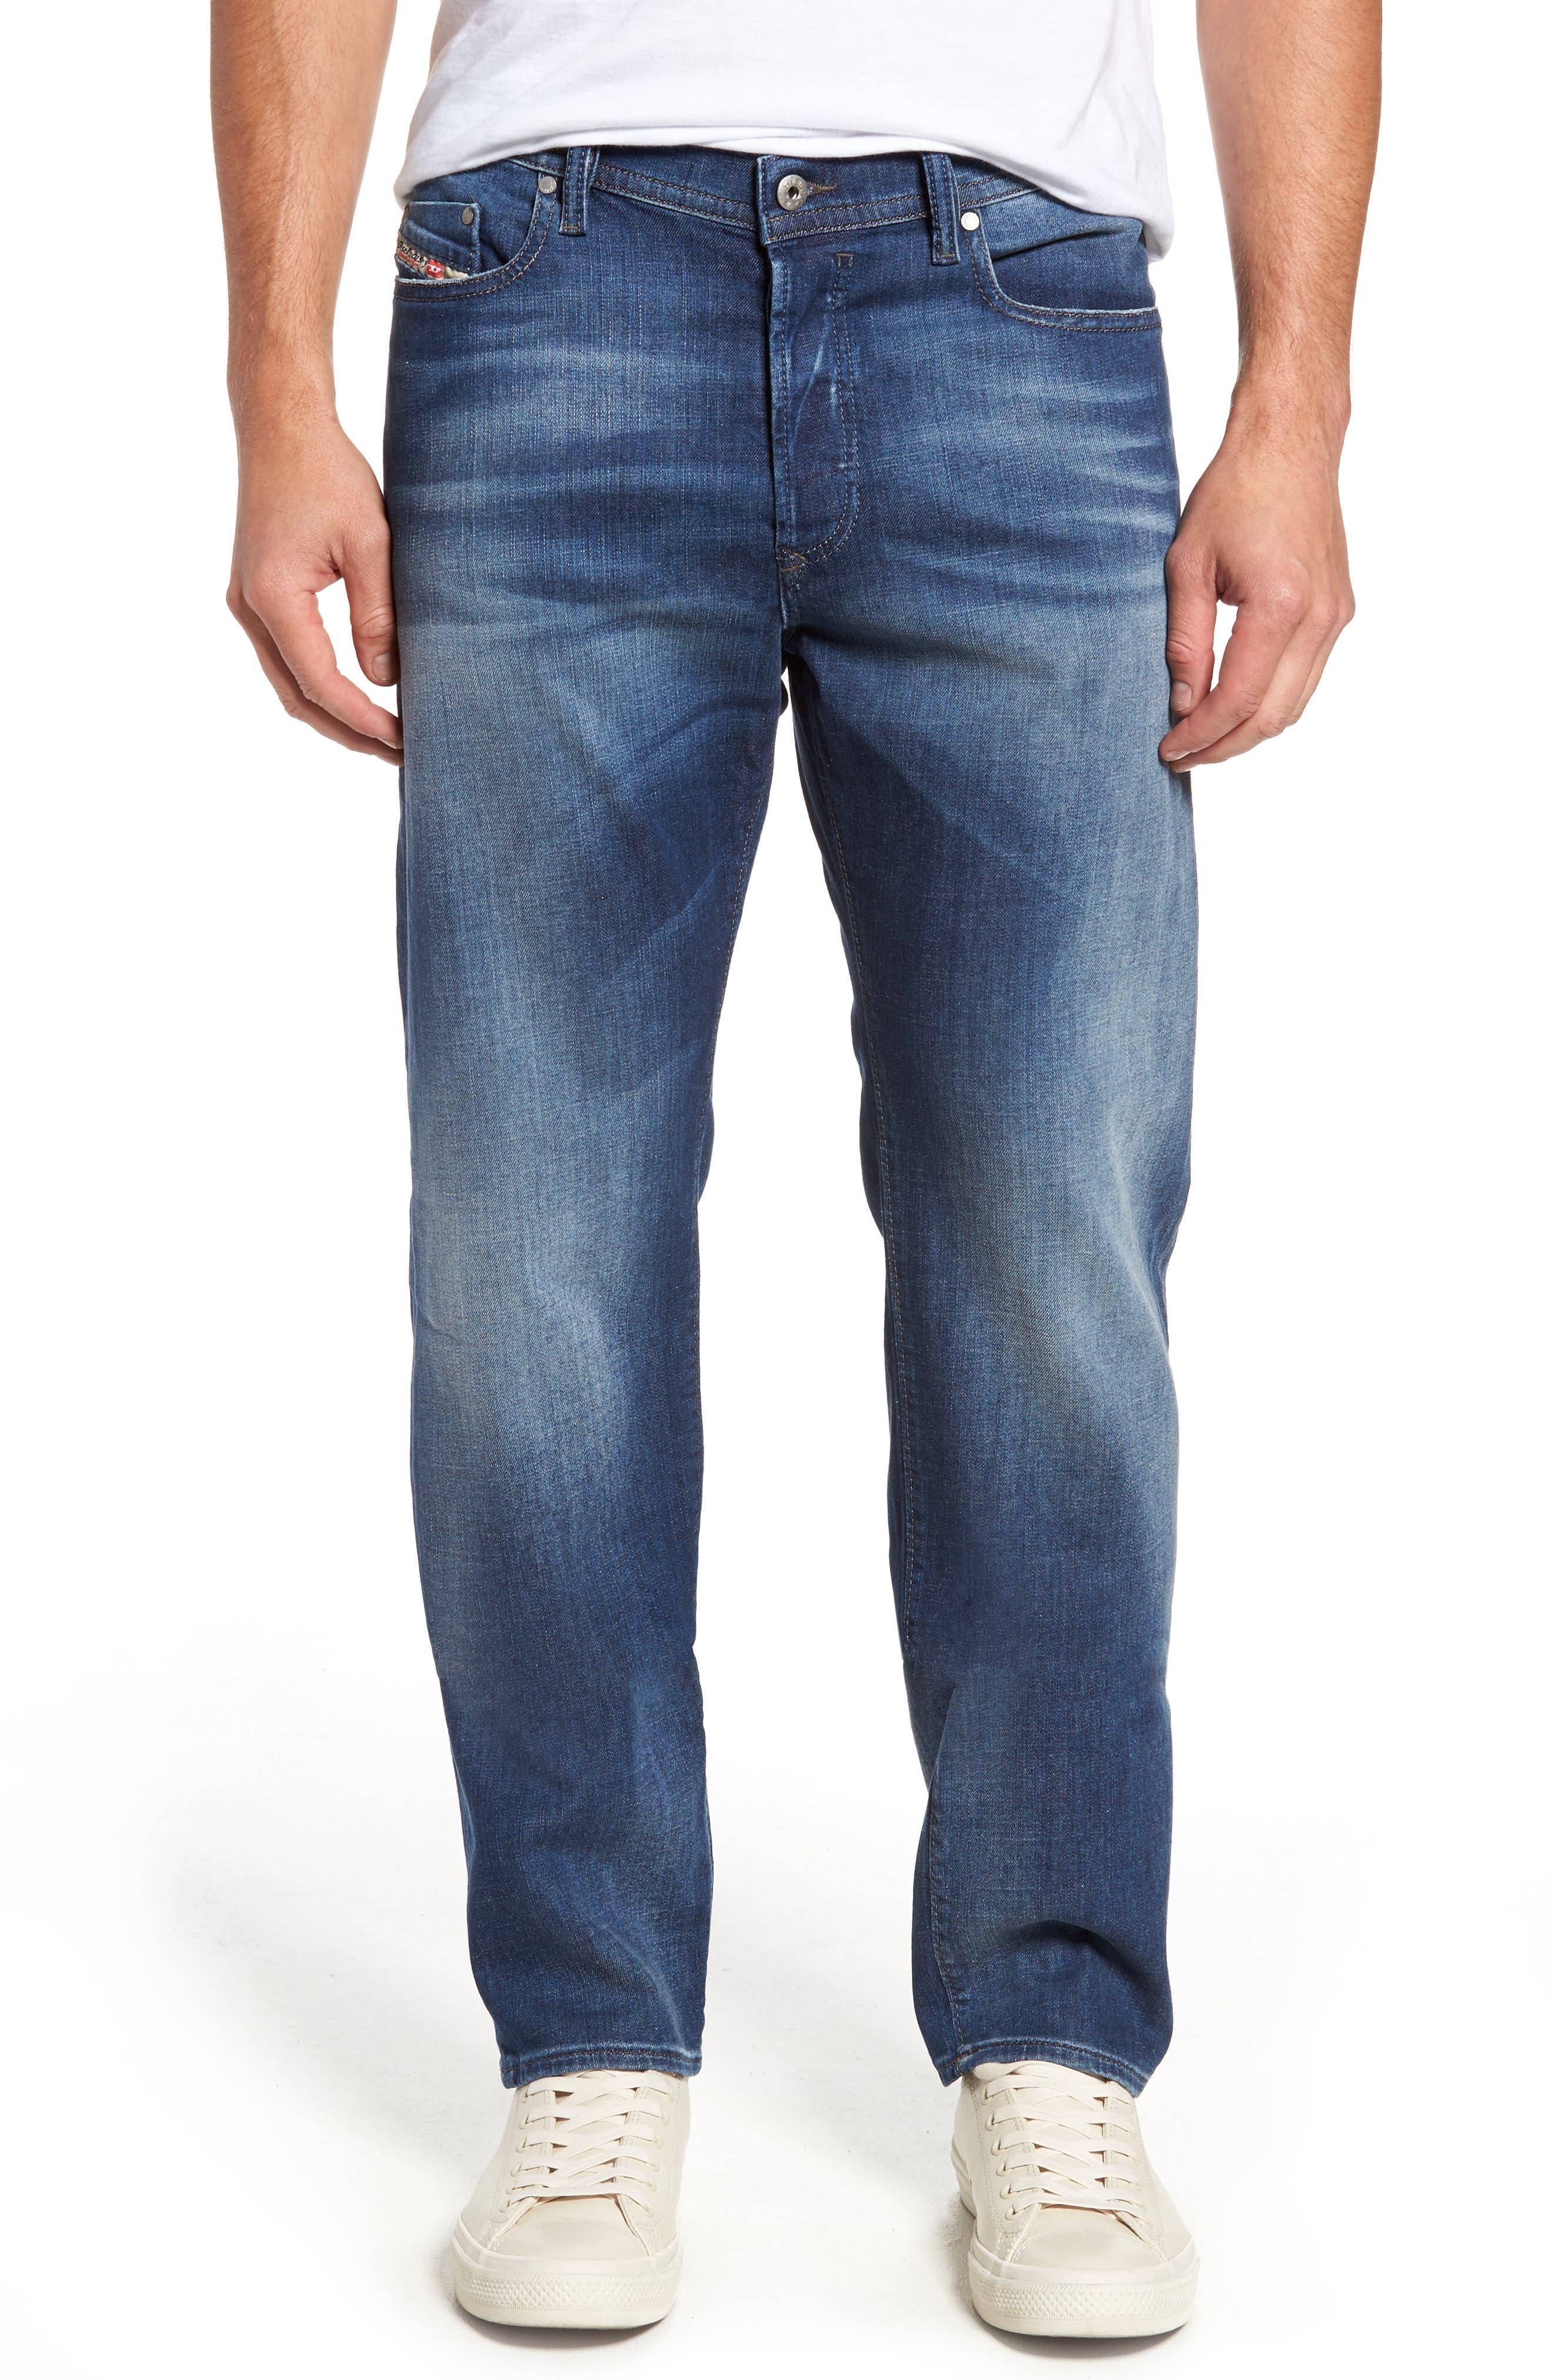 Thytan Straight Leg Jeans,                         Main,                         color, 400